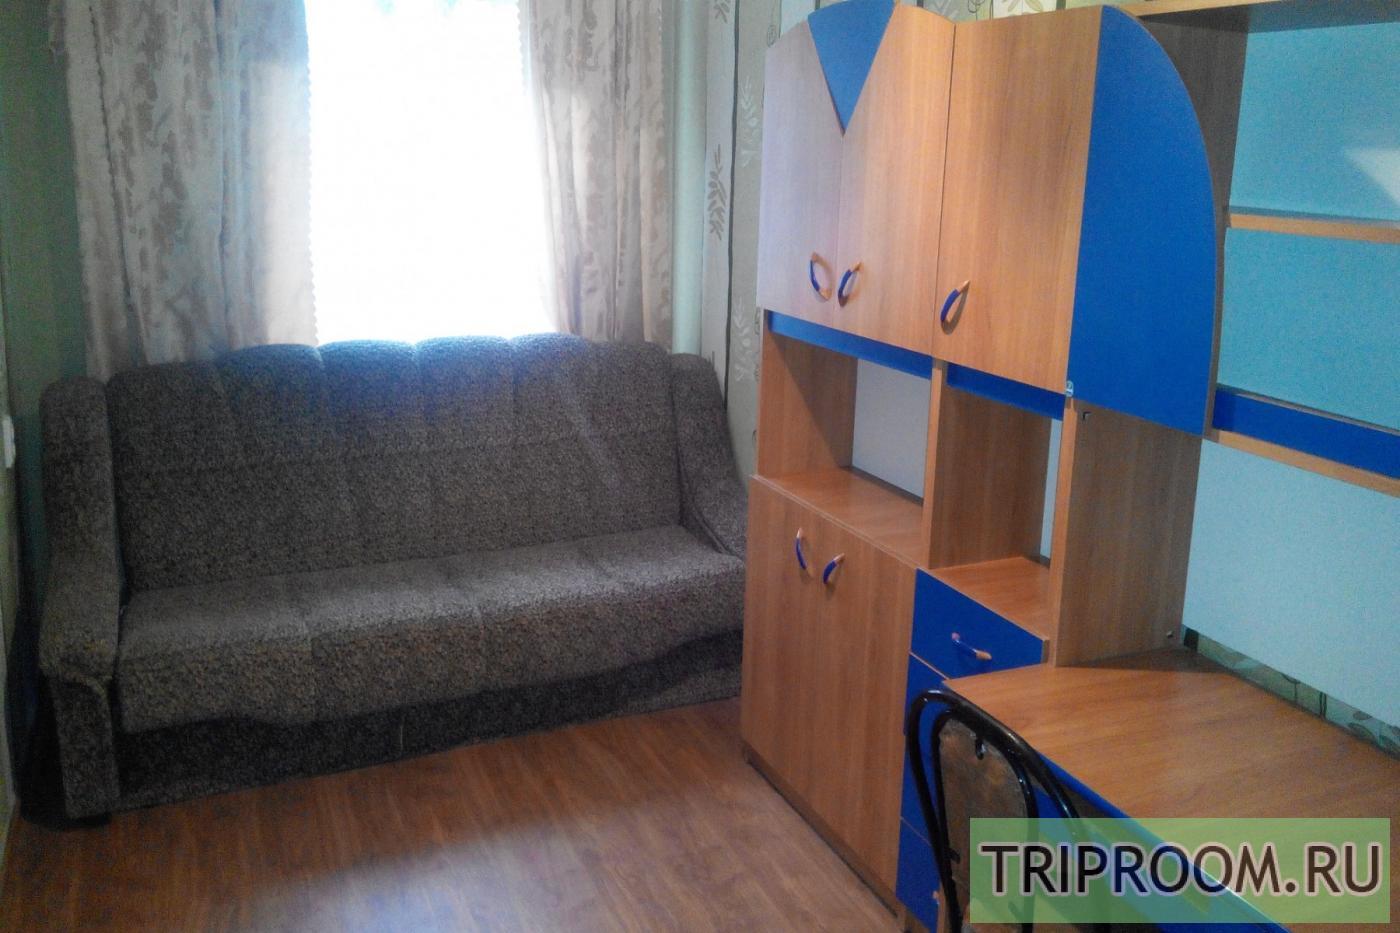 3-комнатная квартира посуточно (вариант № 30860), ул. Гагарина улица, фото № 7